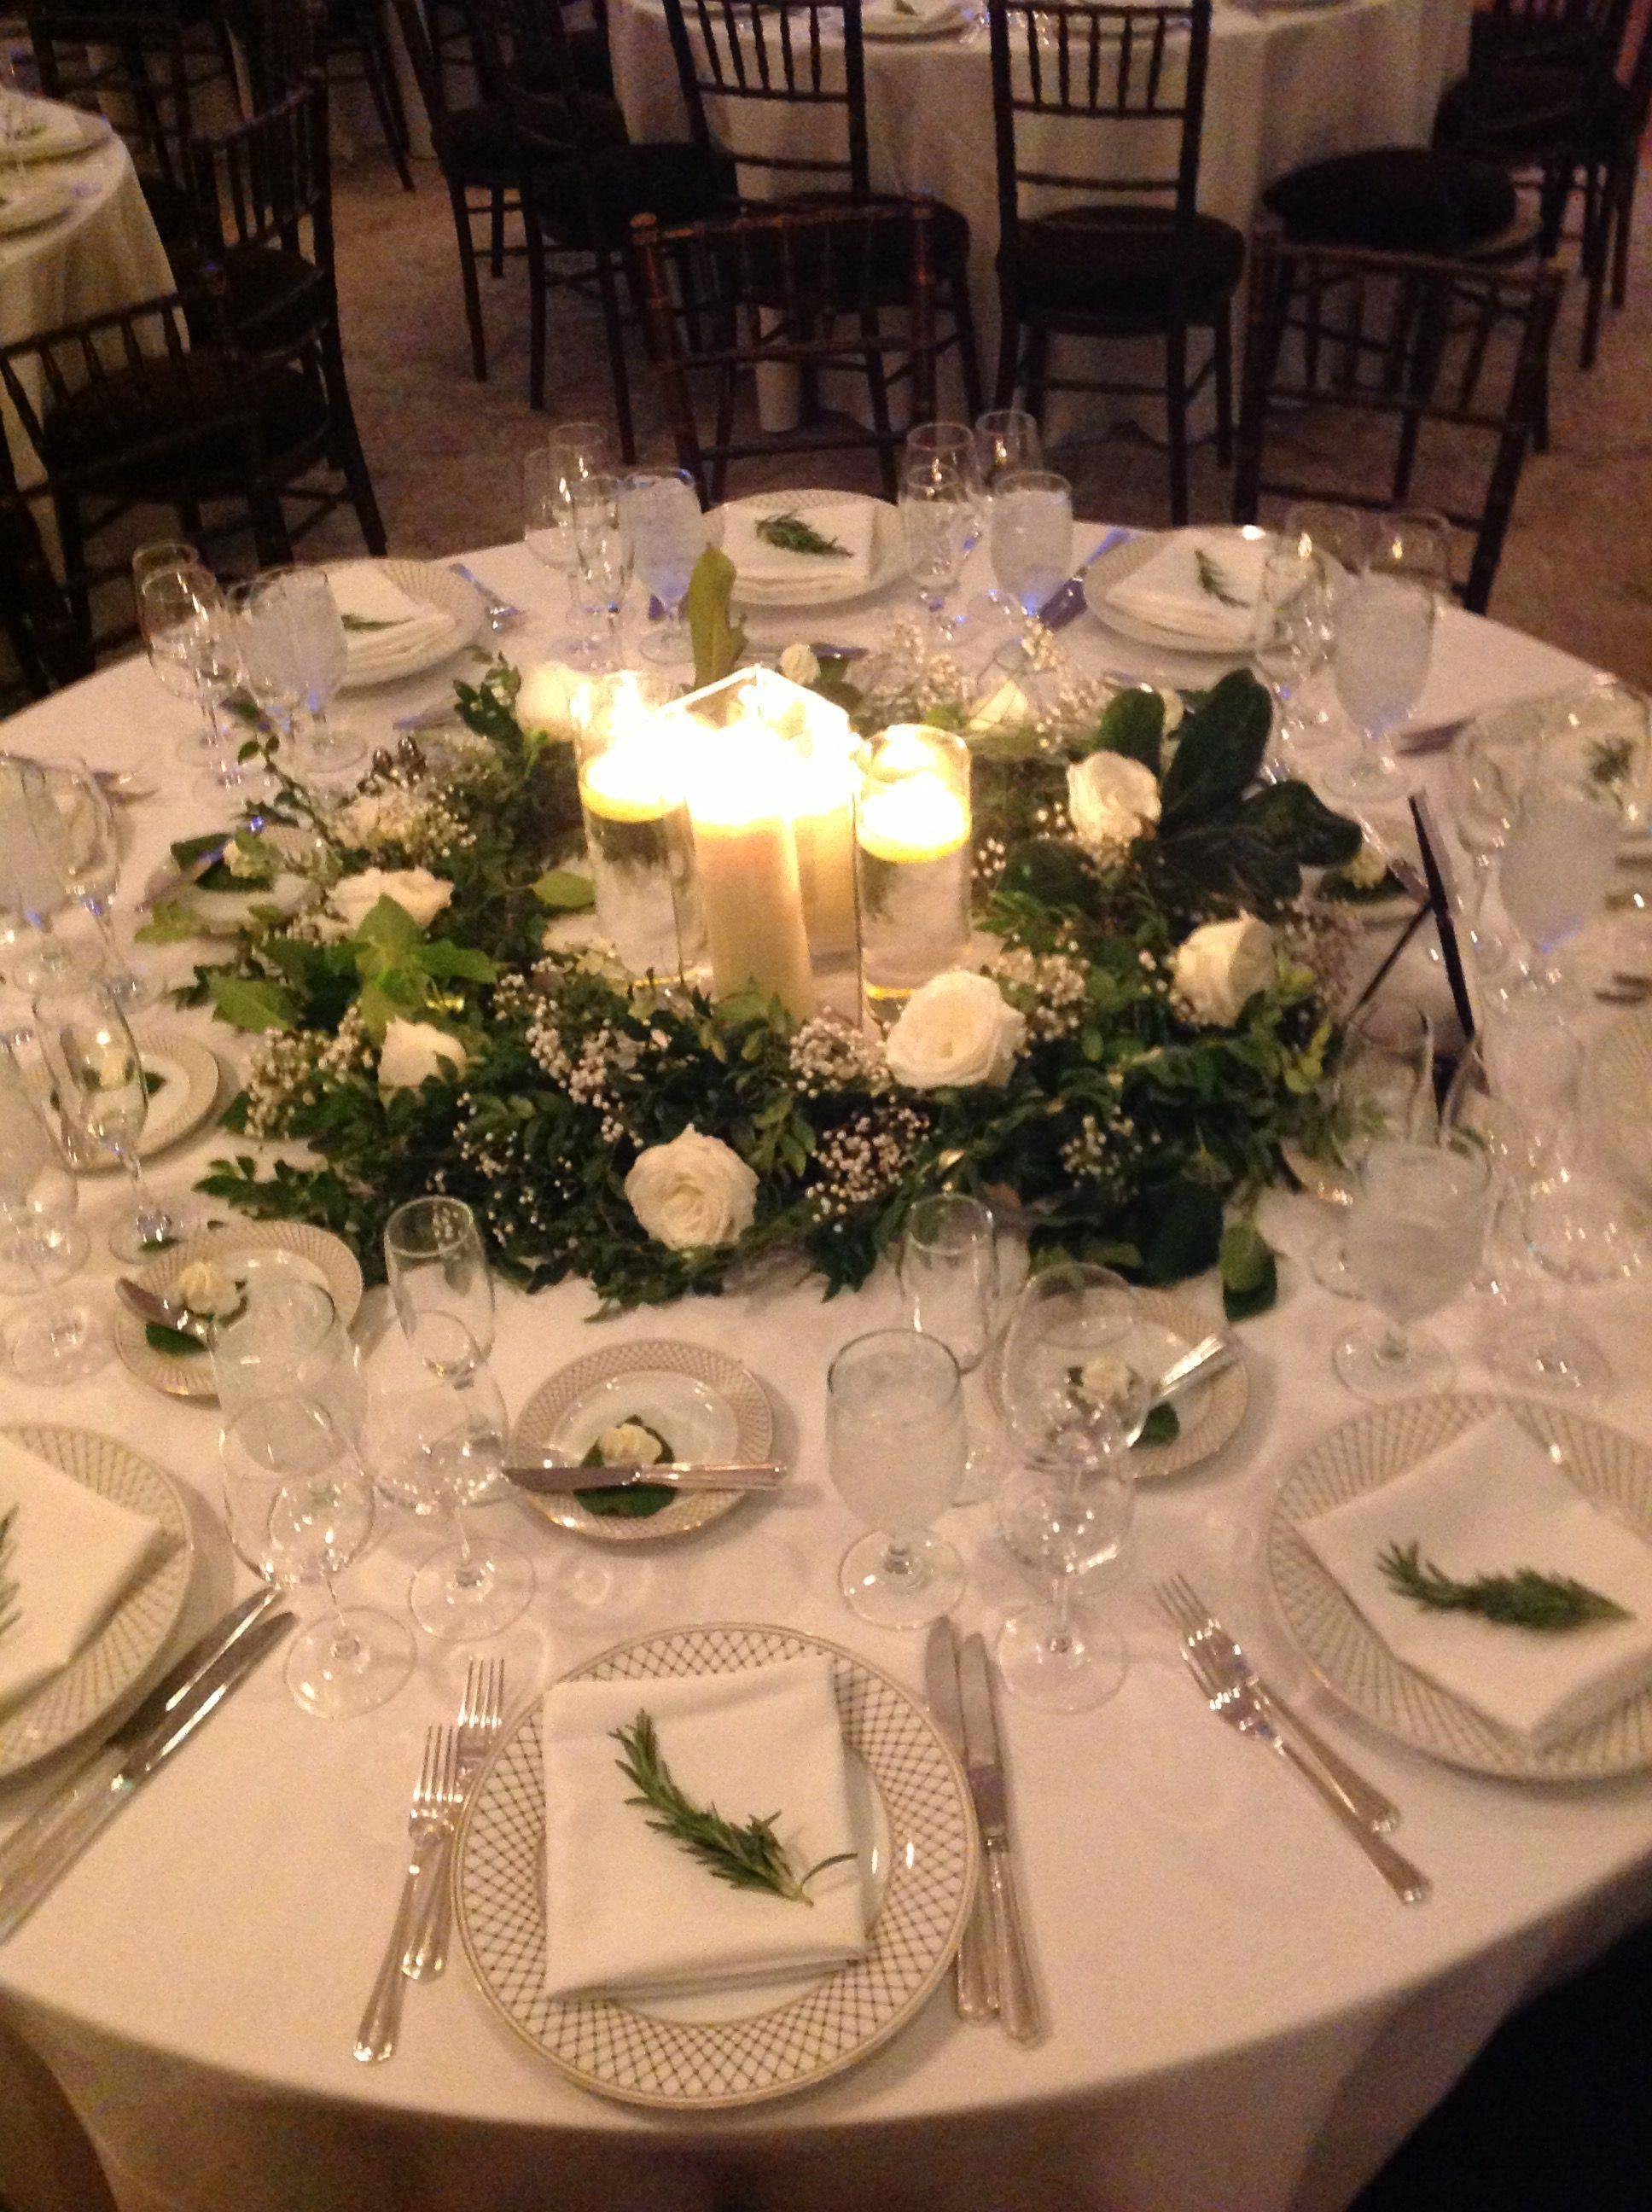 Professional Engineered Wedding Centerpiece Like Round Wedding Tables Christmas Wedding Centerpieces Wedding Table Centerpieces